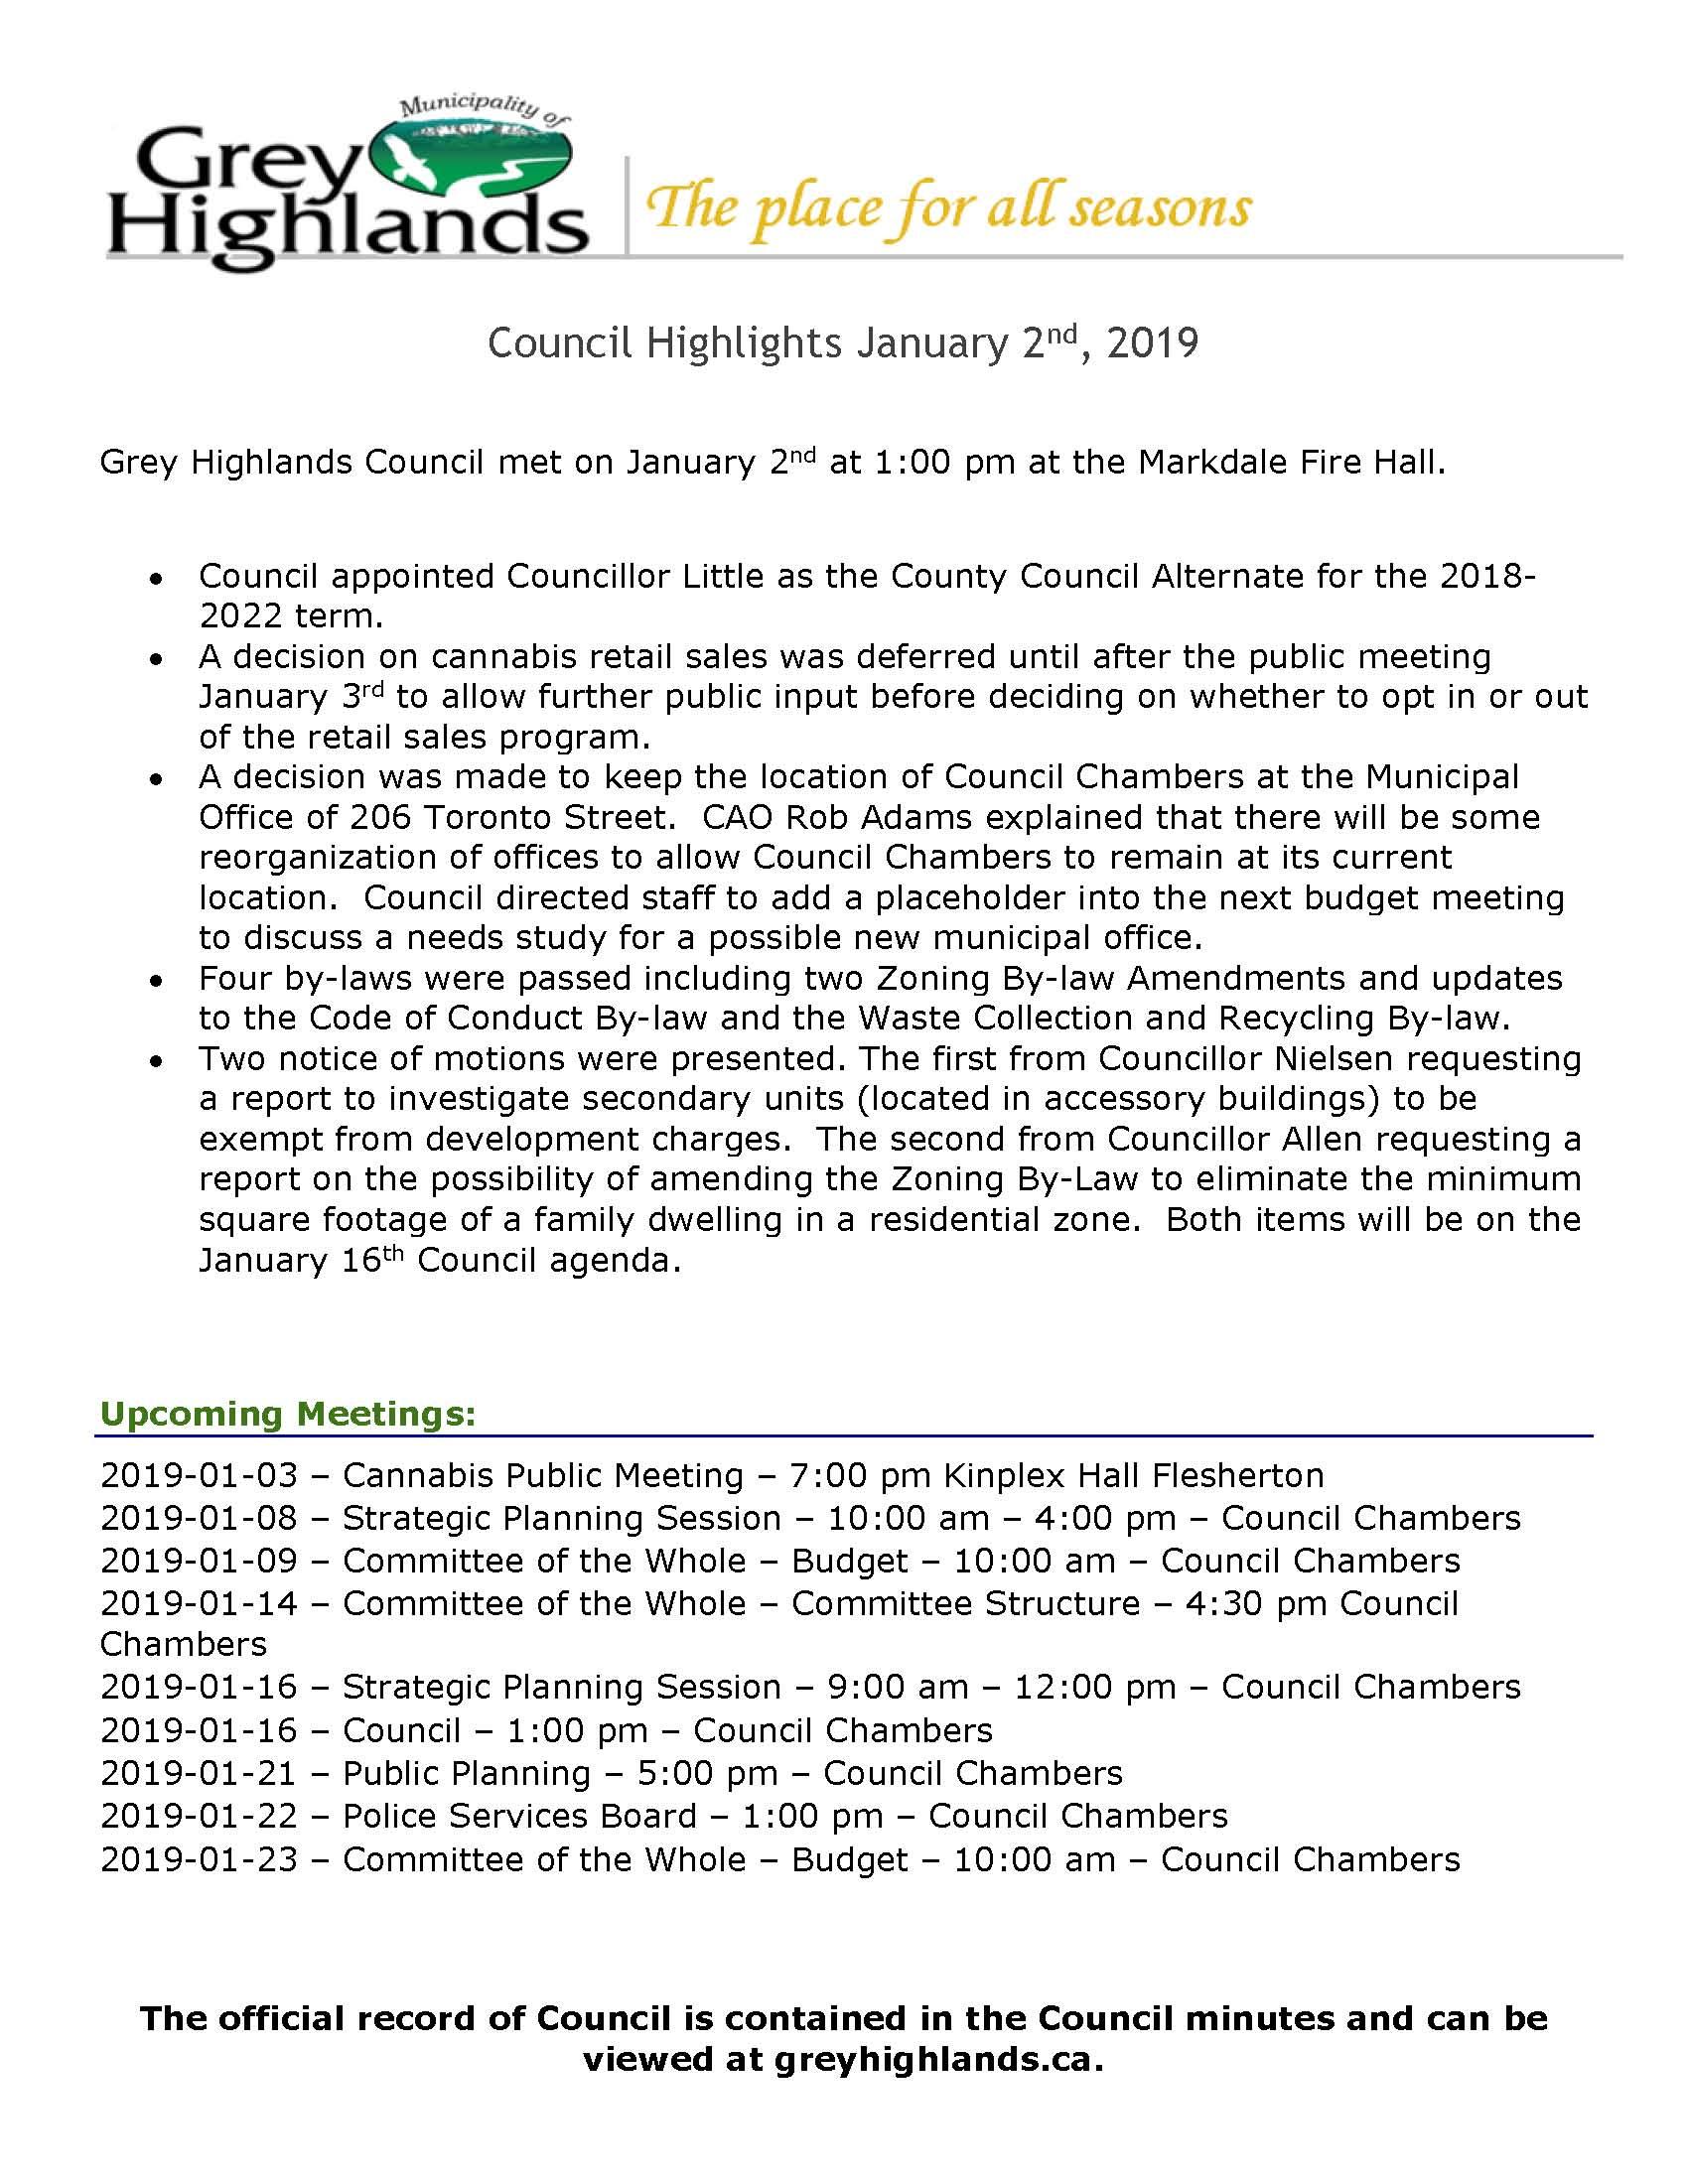 Council Highlights - January 2, 2019